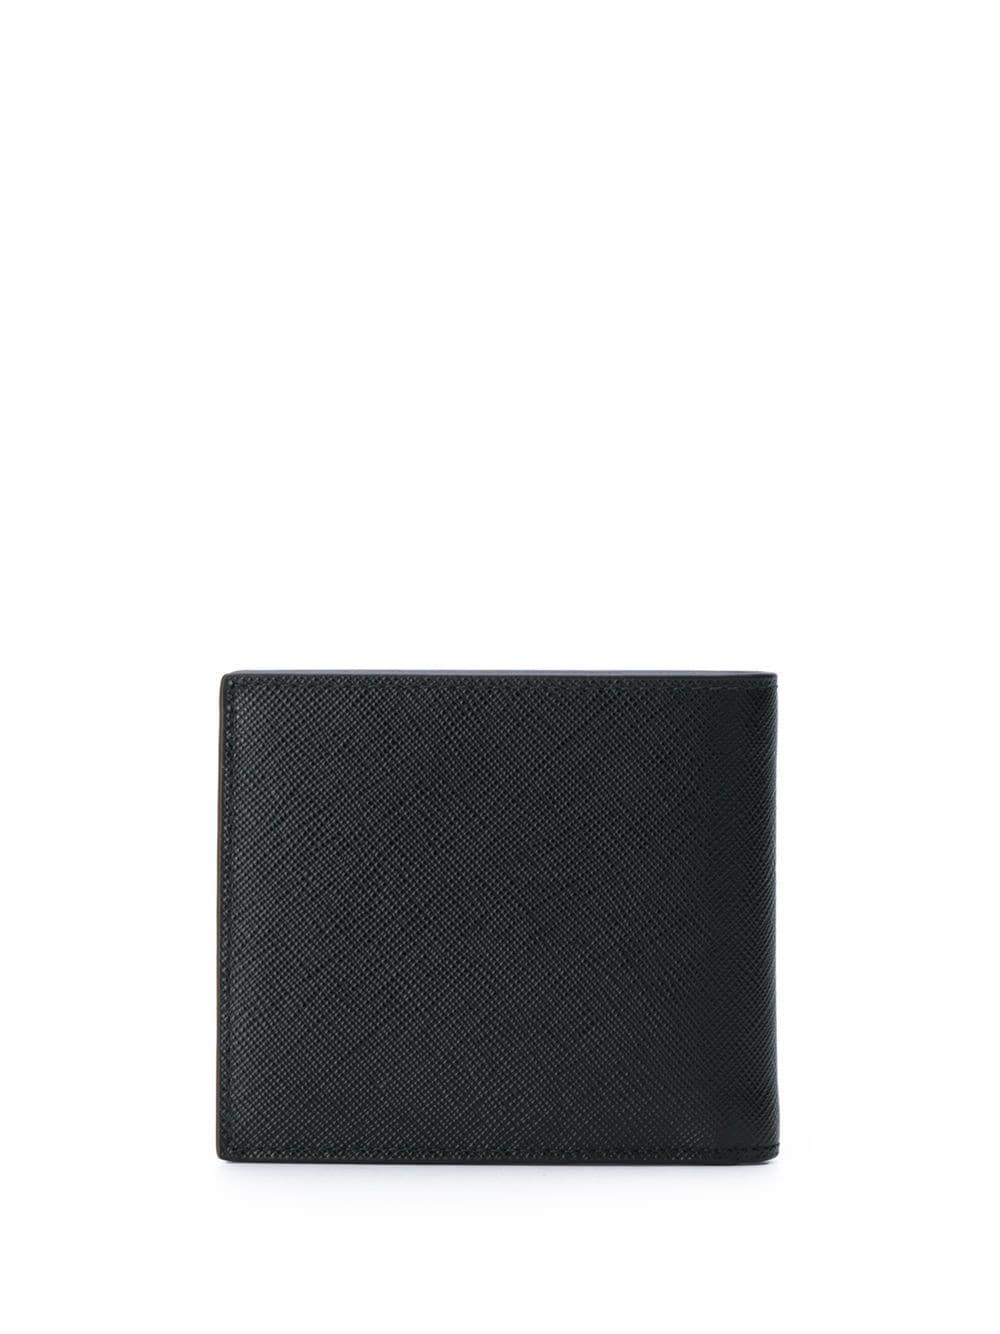 832d45f48a6d Prada Logo Plaque Wallet in Black for Men - Lyst